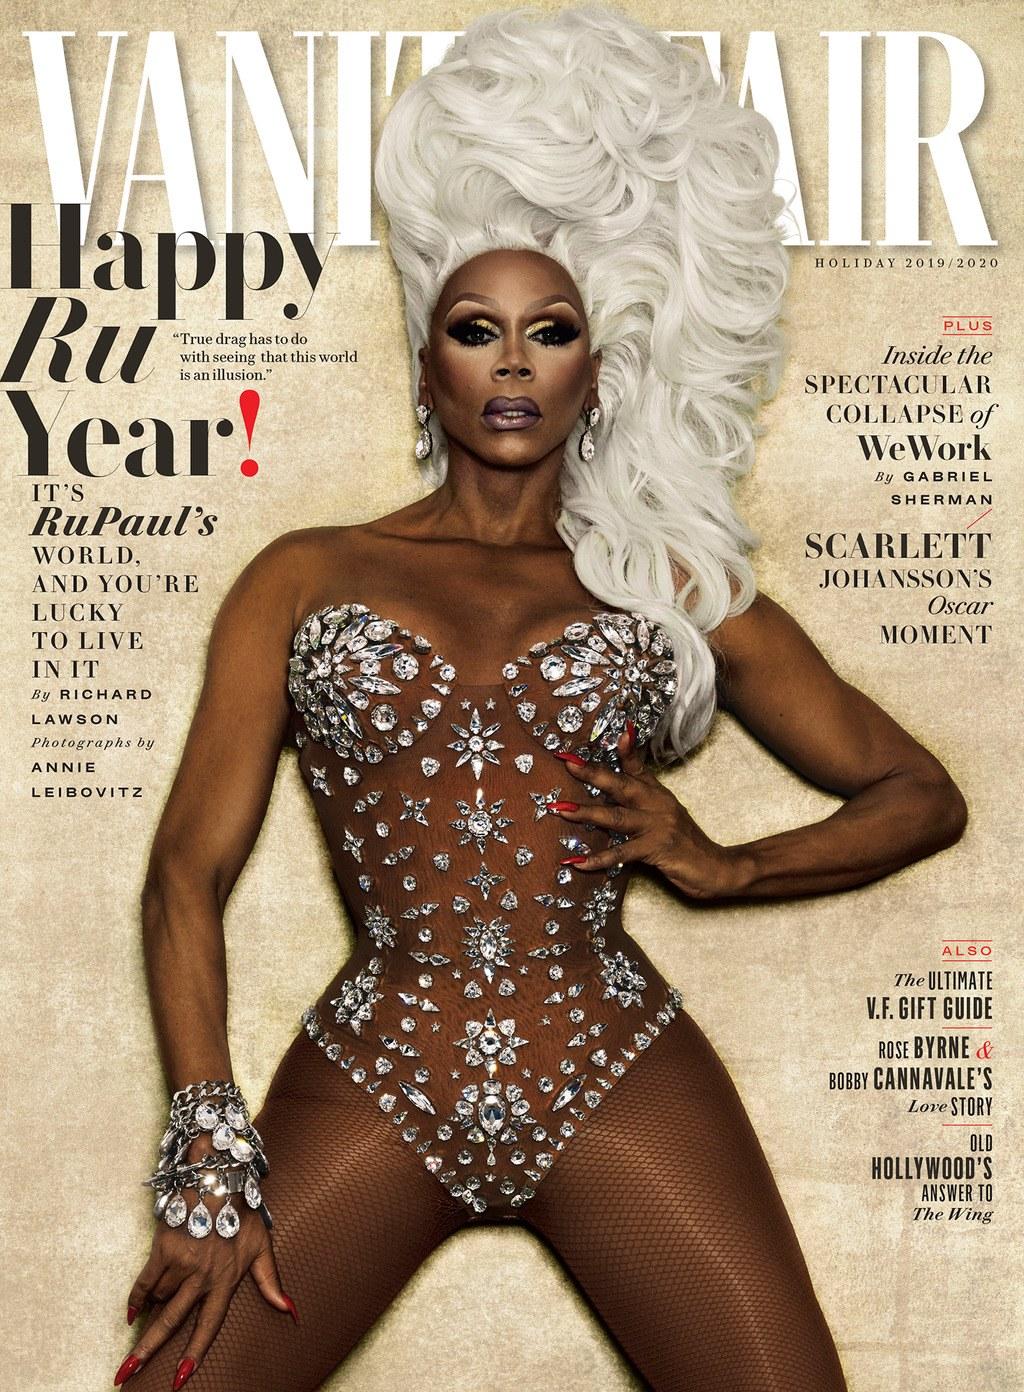 Rupaul on the cover of Vanity Fair